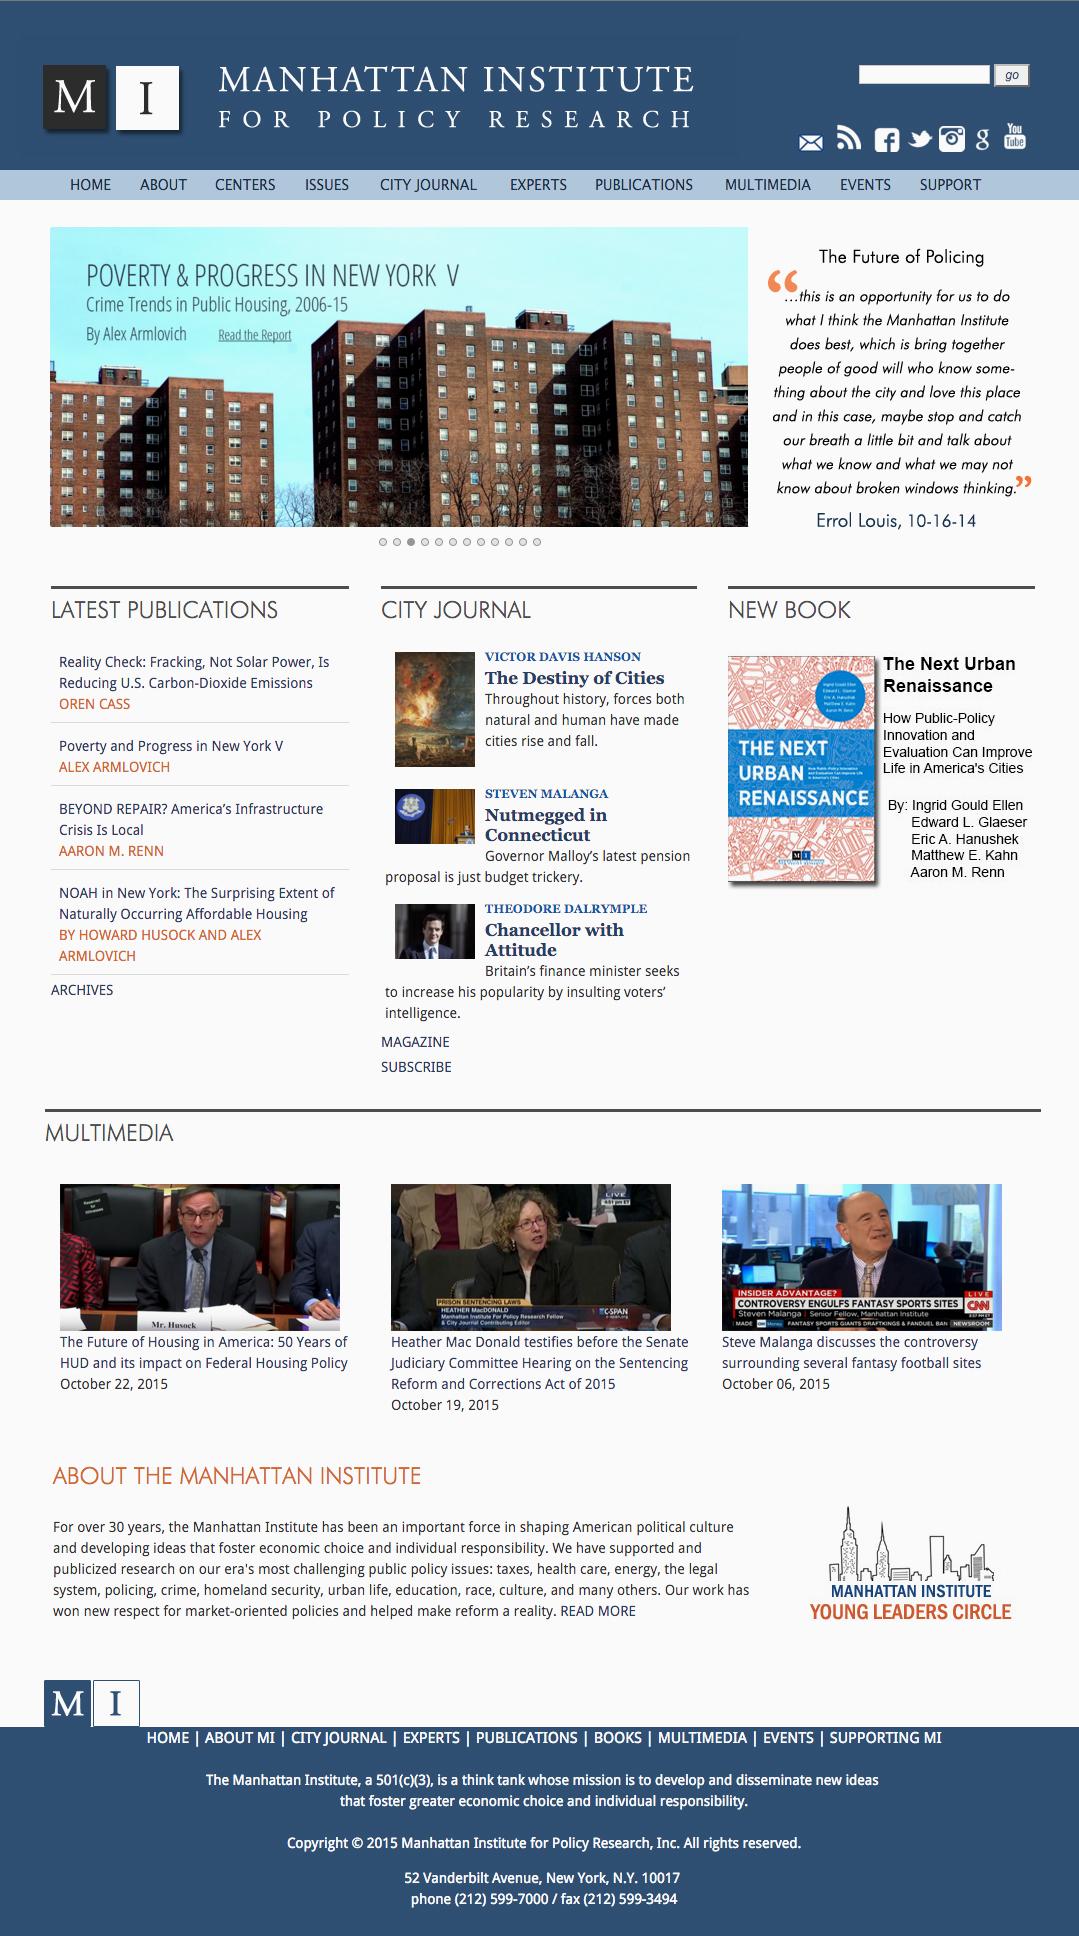 Previous Manhattan Institute Homepage